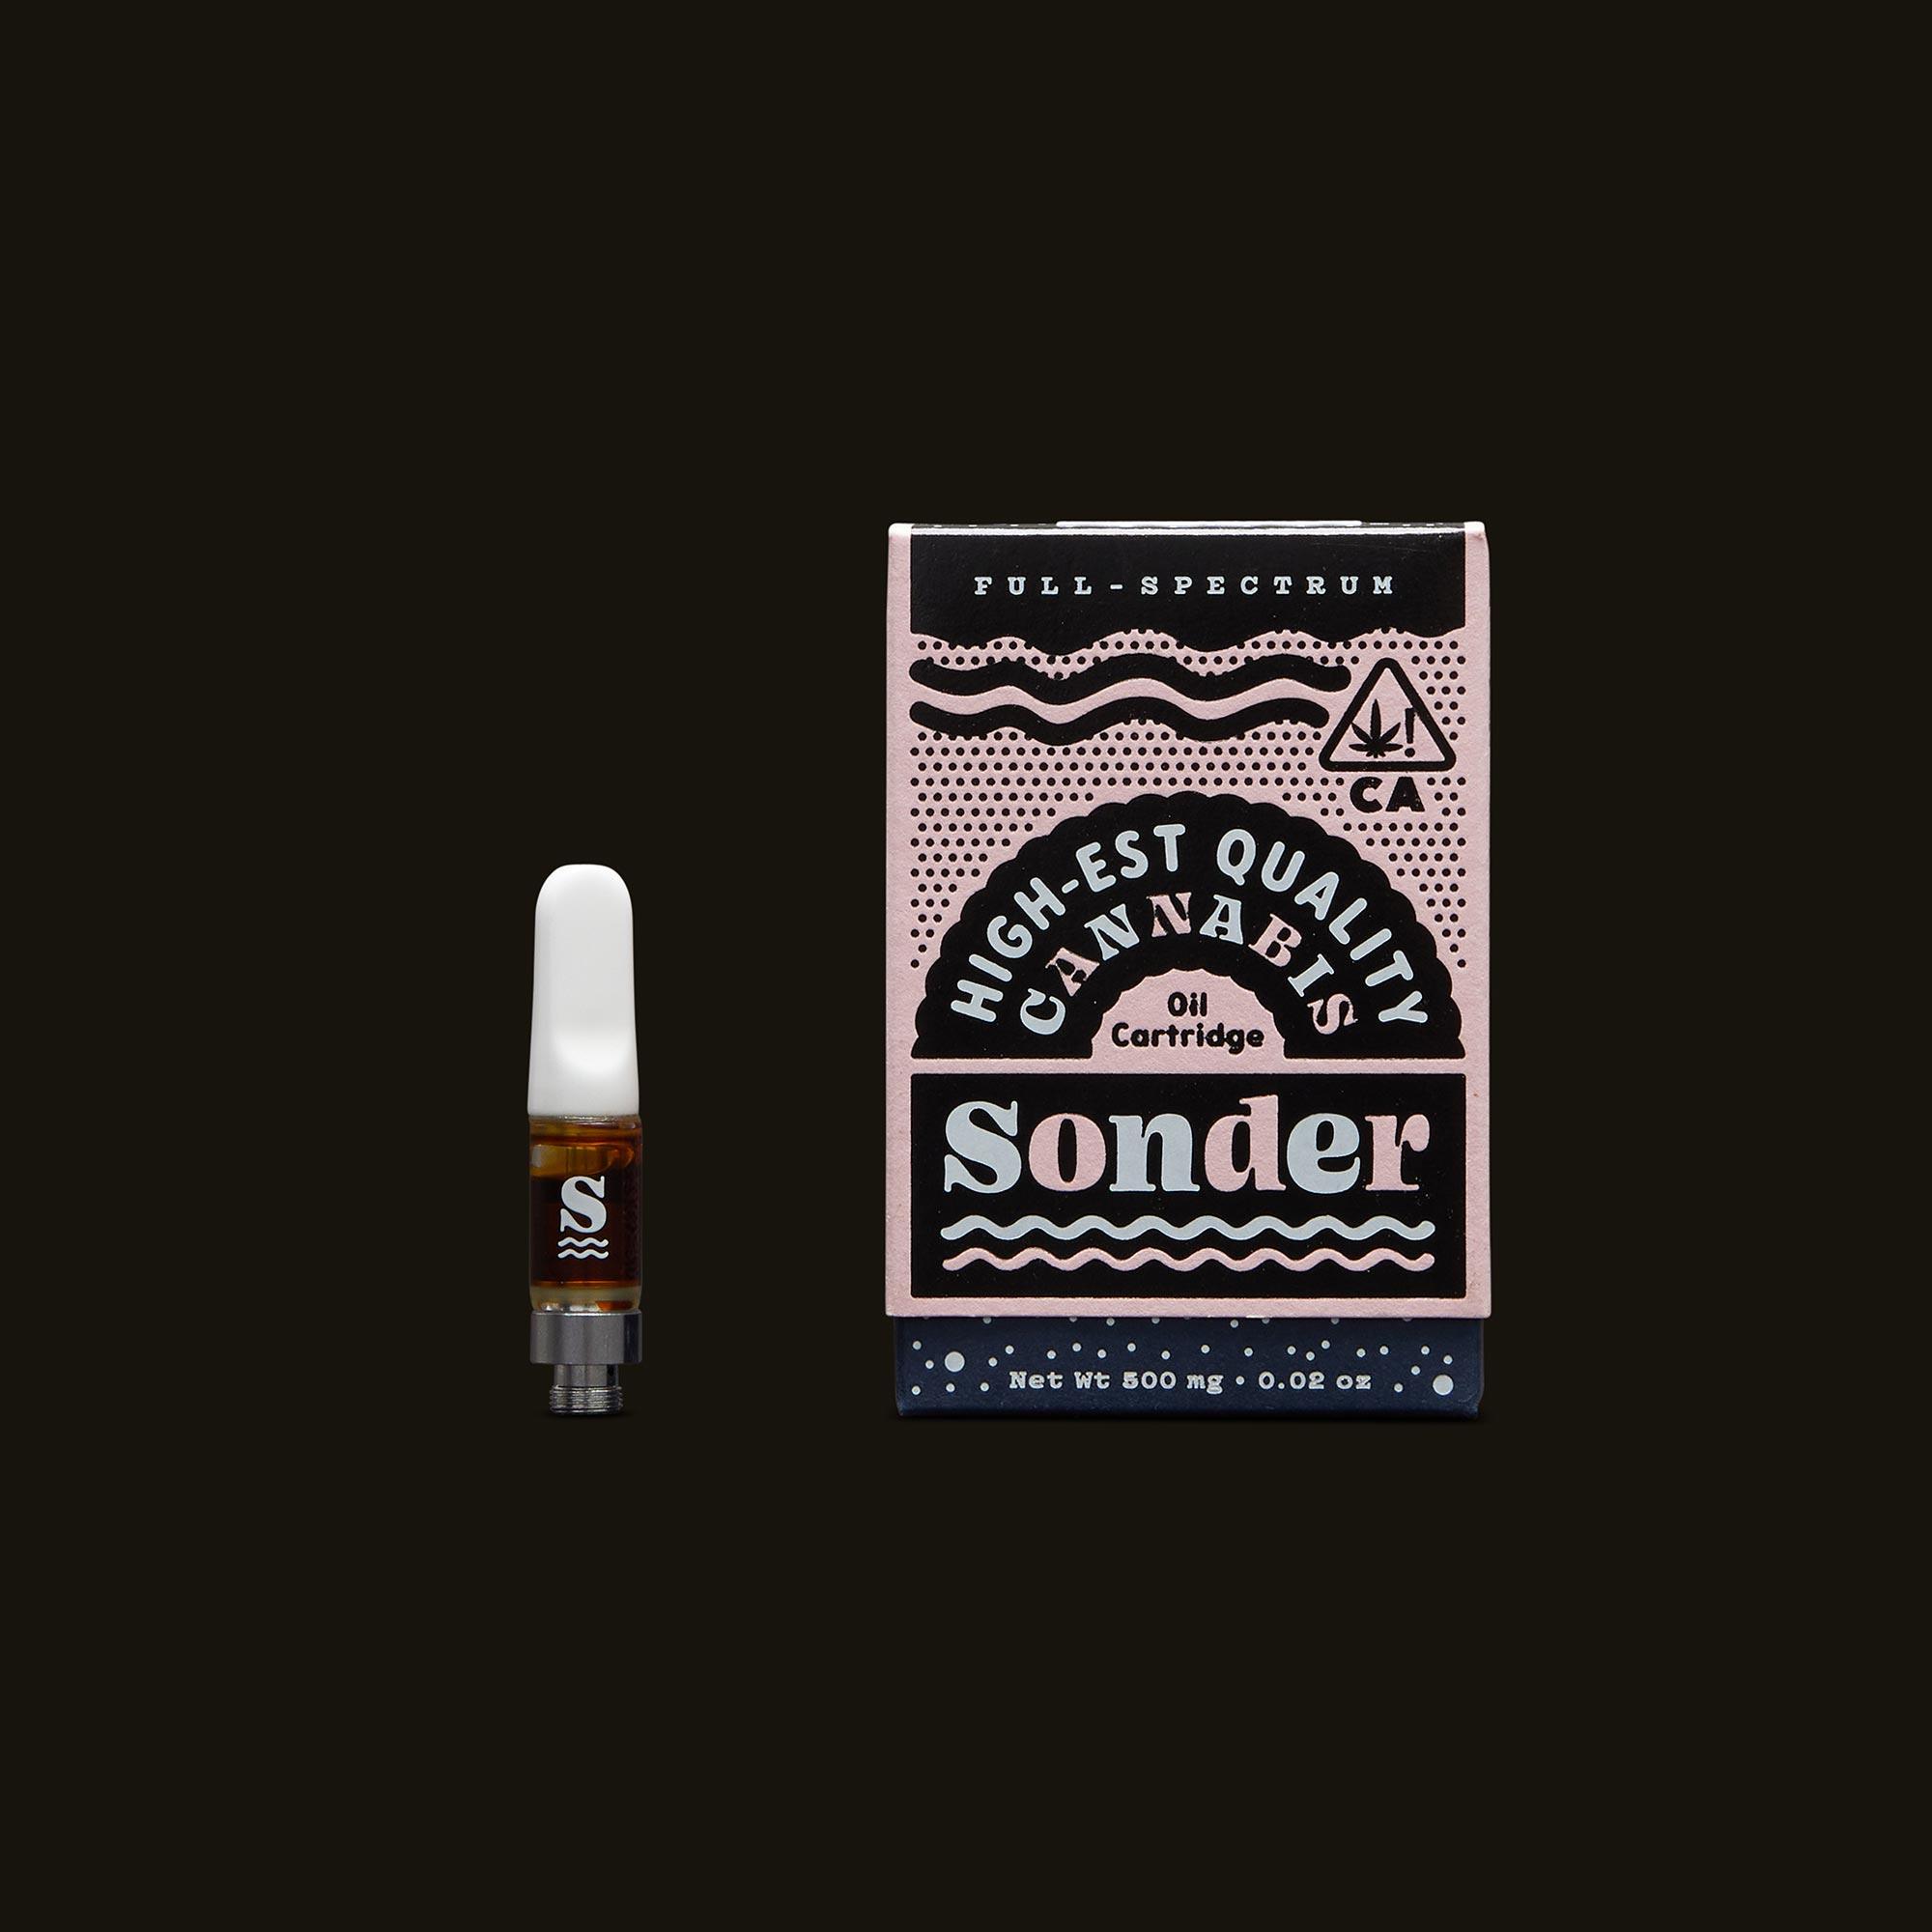 Sonder Blast Off Cartridge